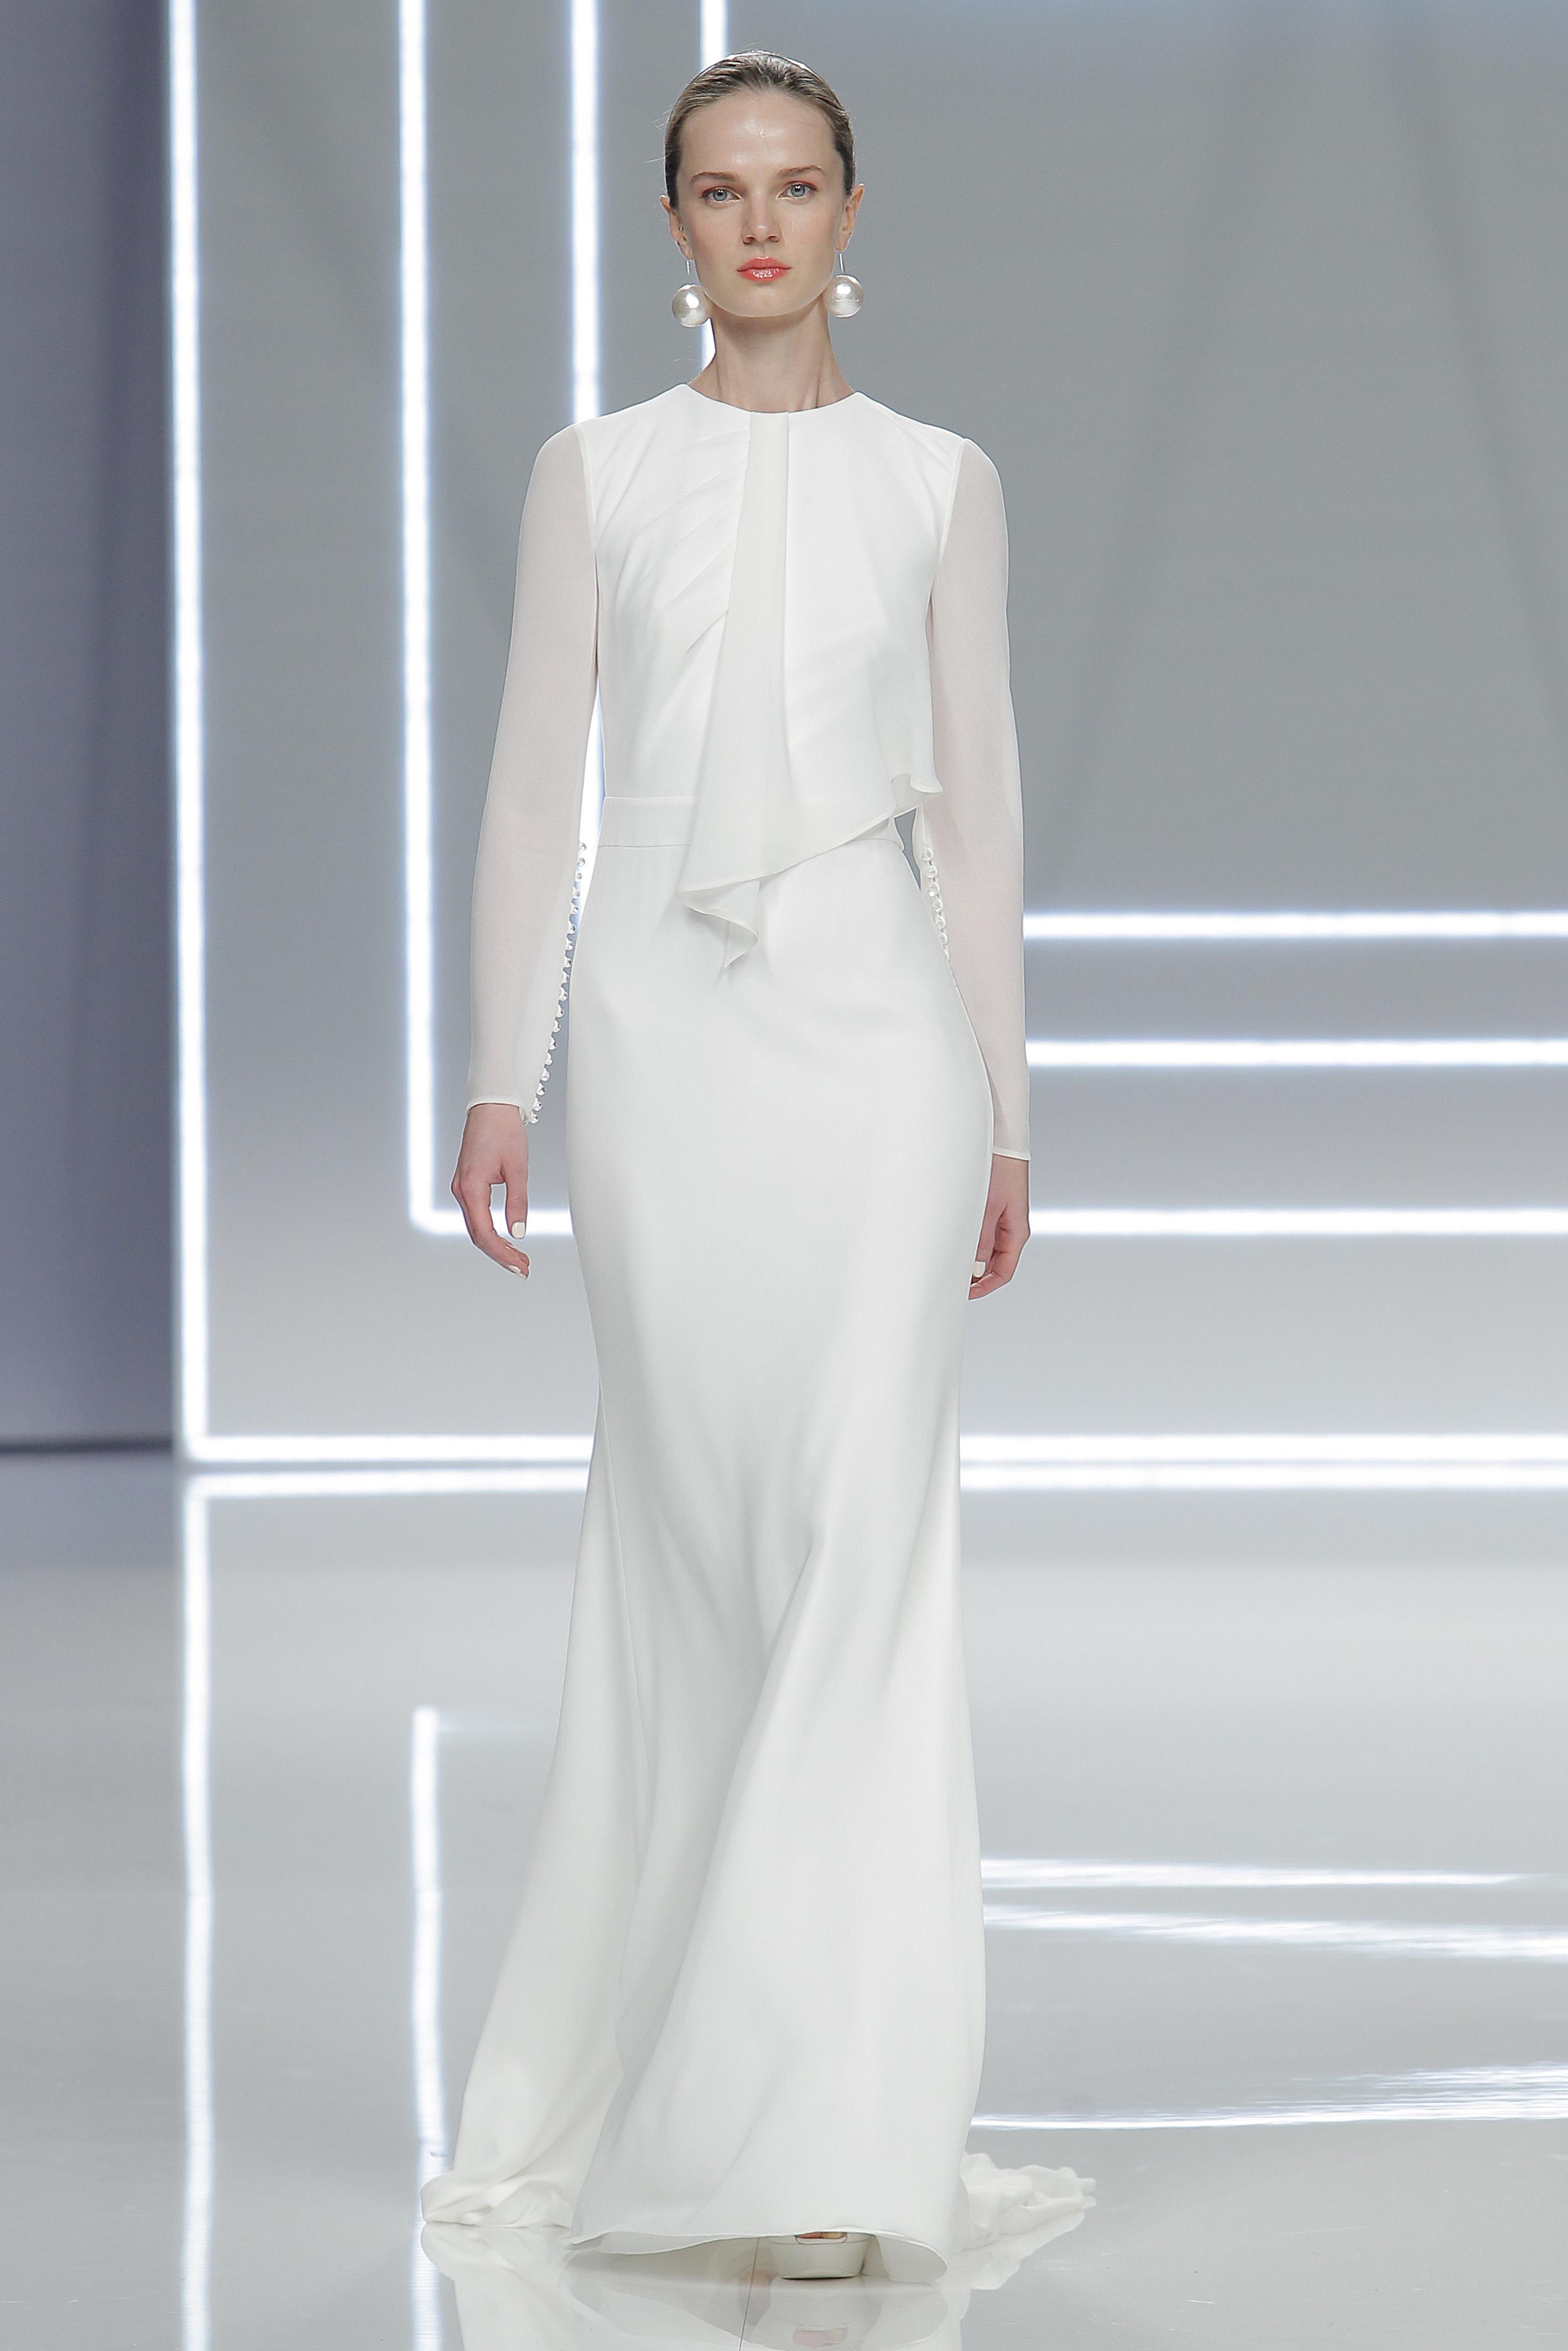 A look by Rosa Clará at Barcelona Bridal Fashion week.